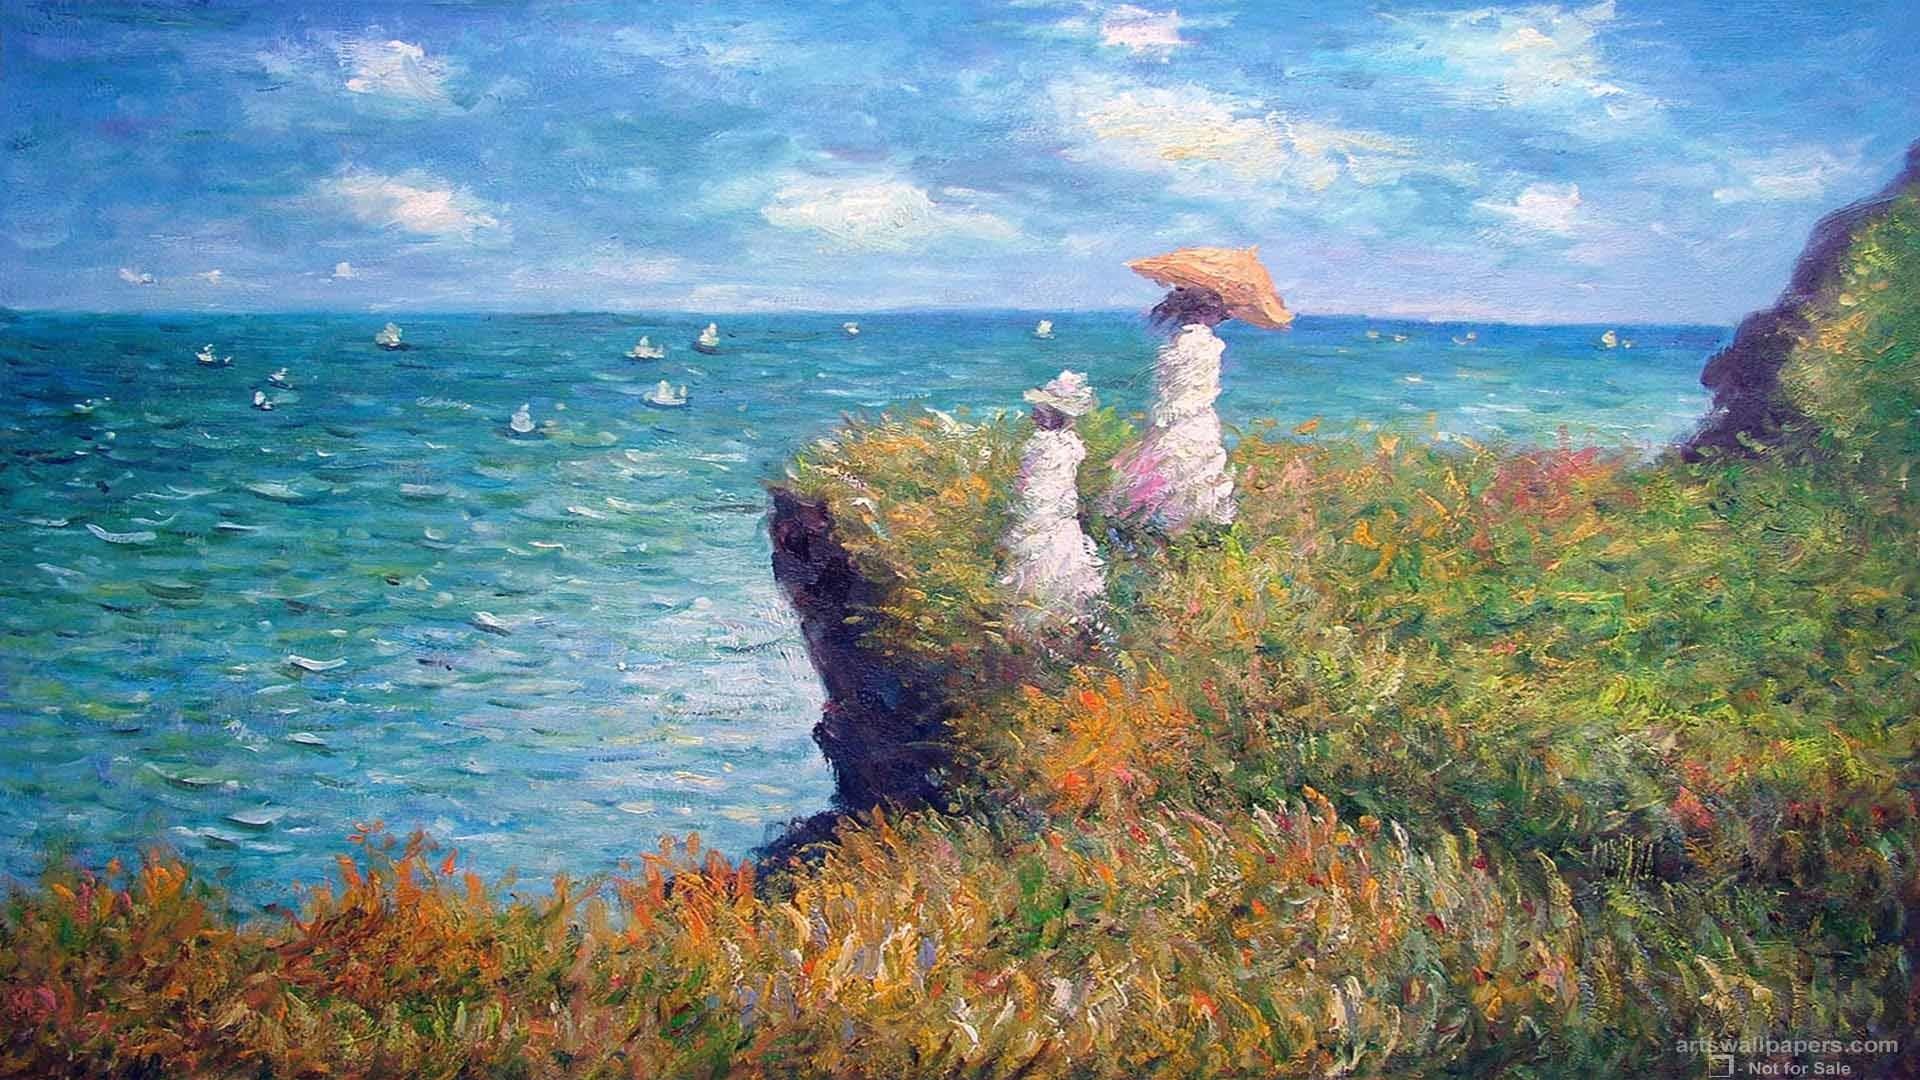 Hd Monet Wallpaper 41 Images